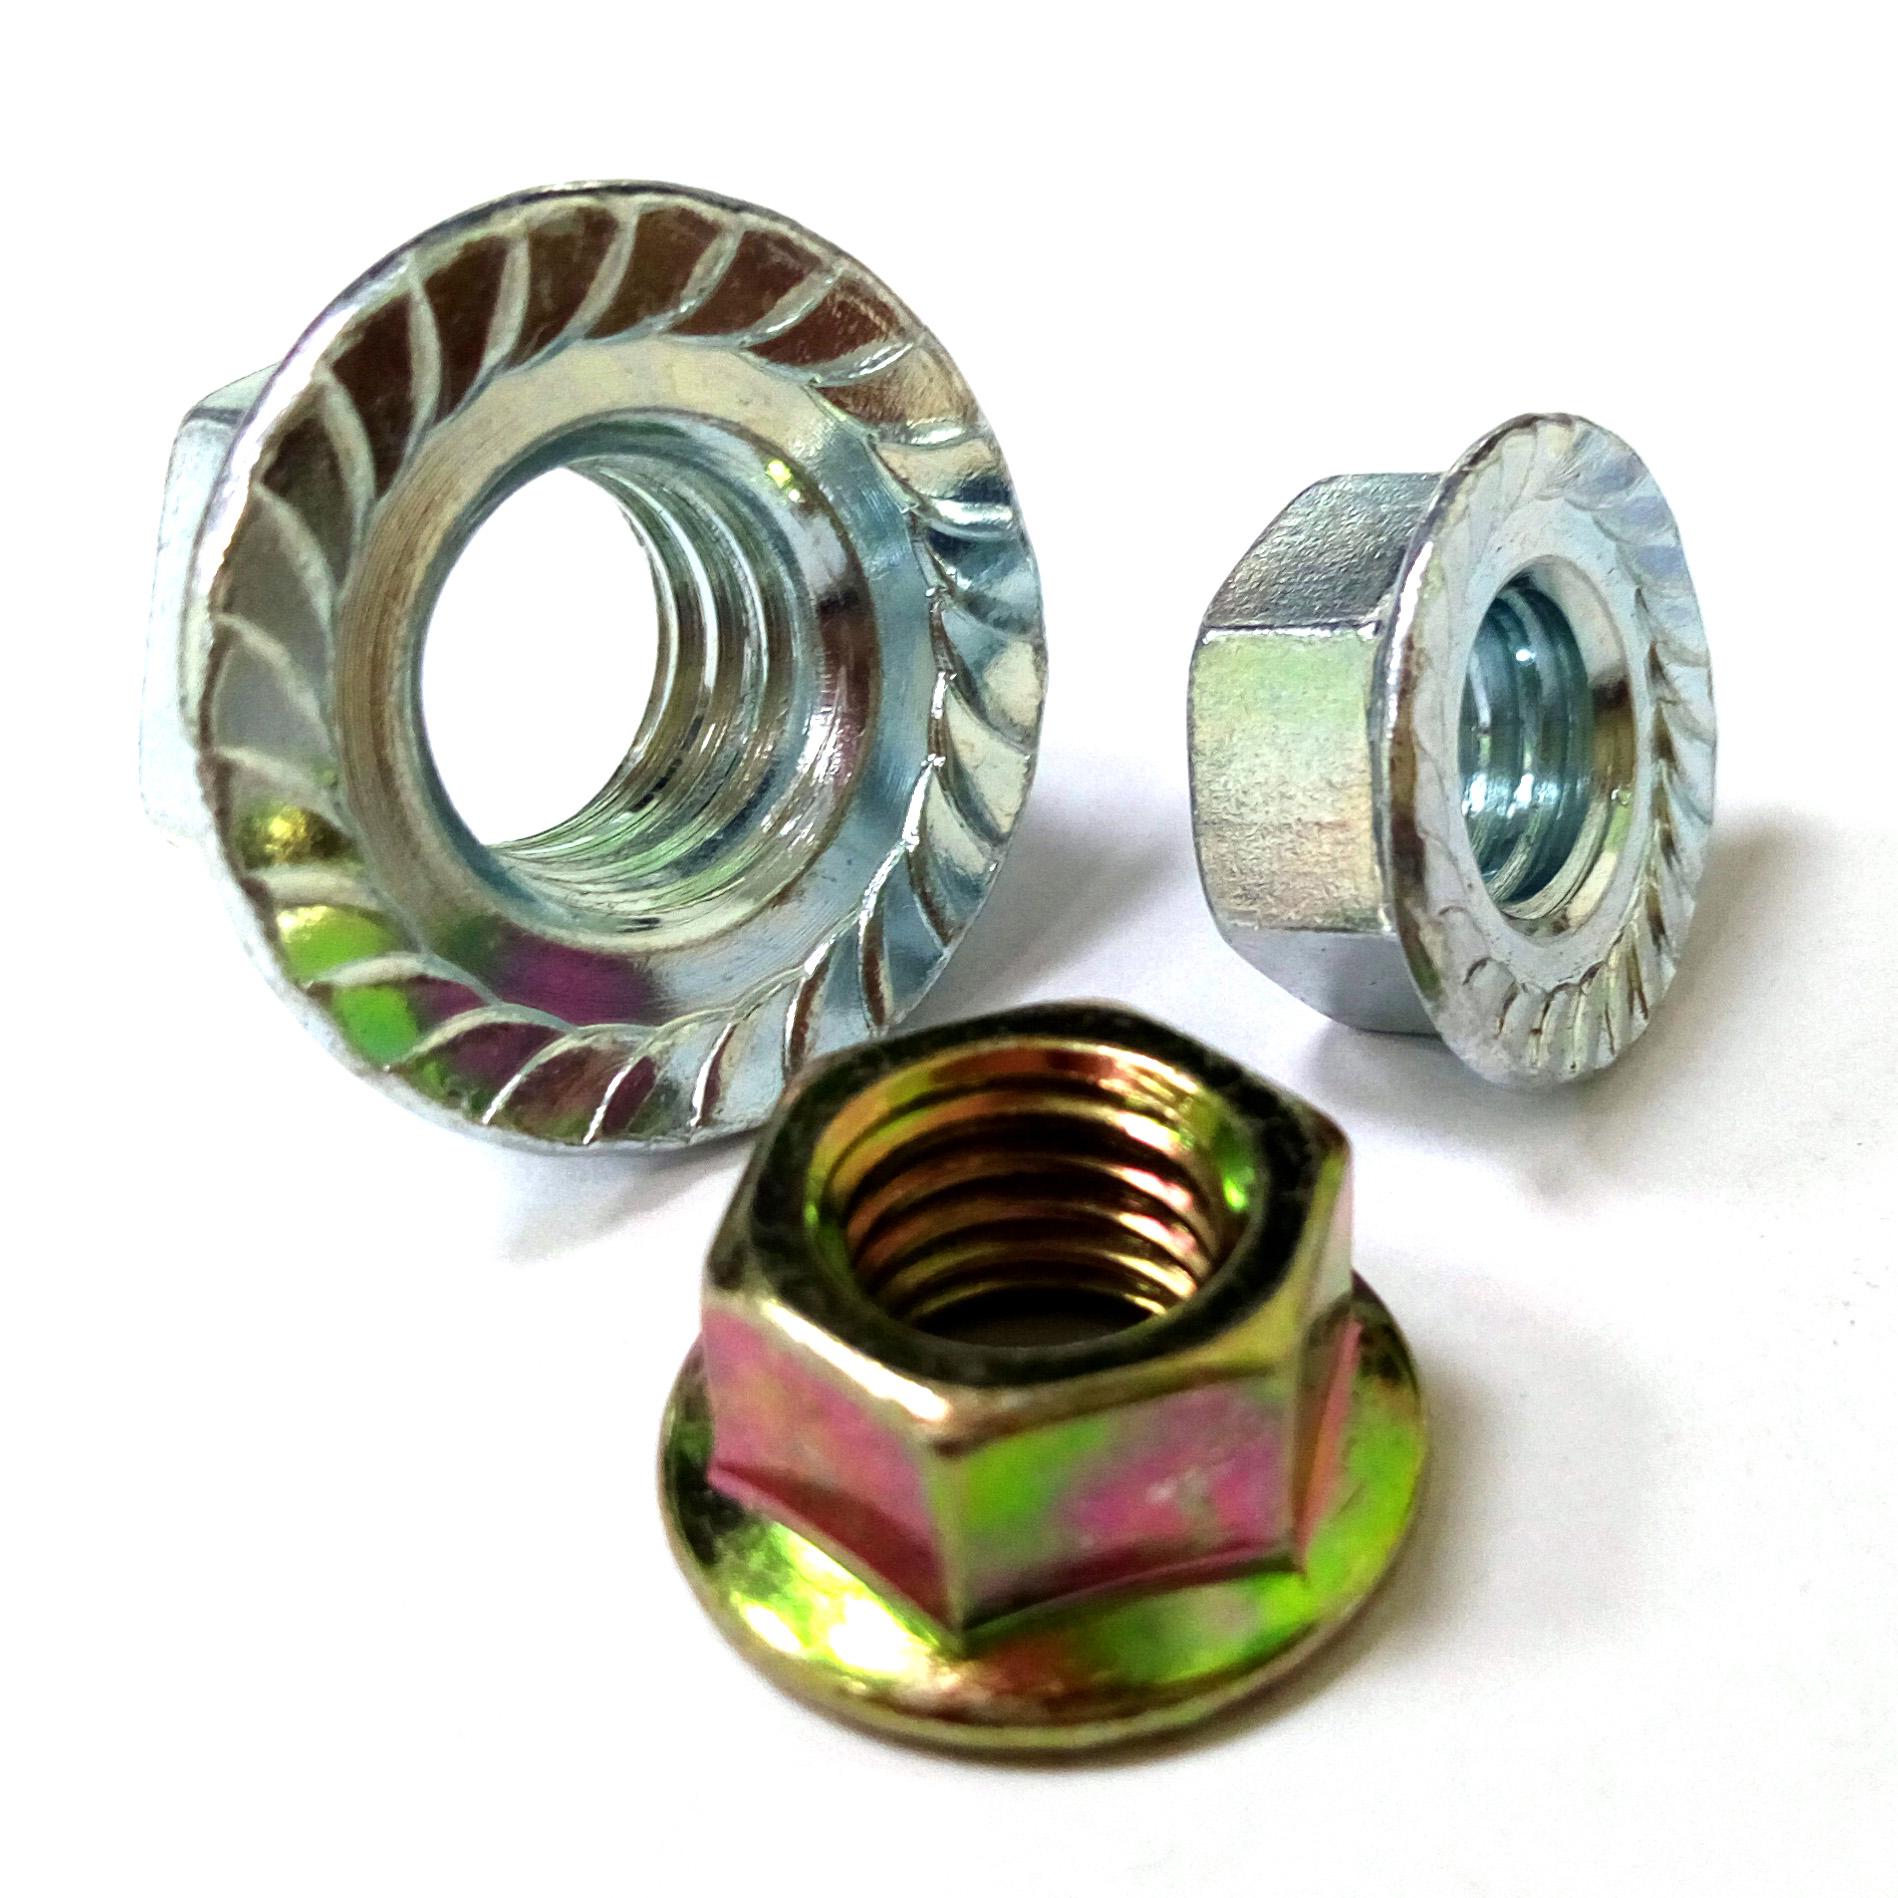 flange nut-2.JPG